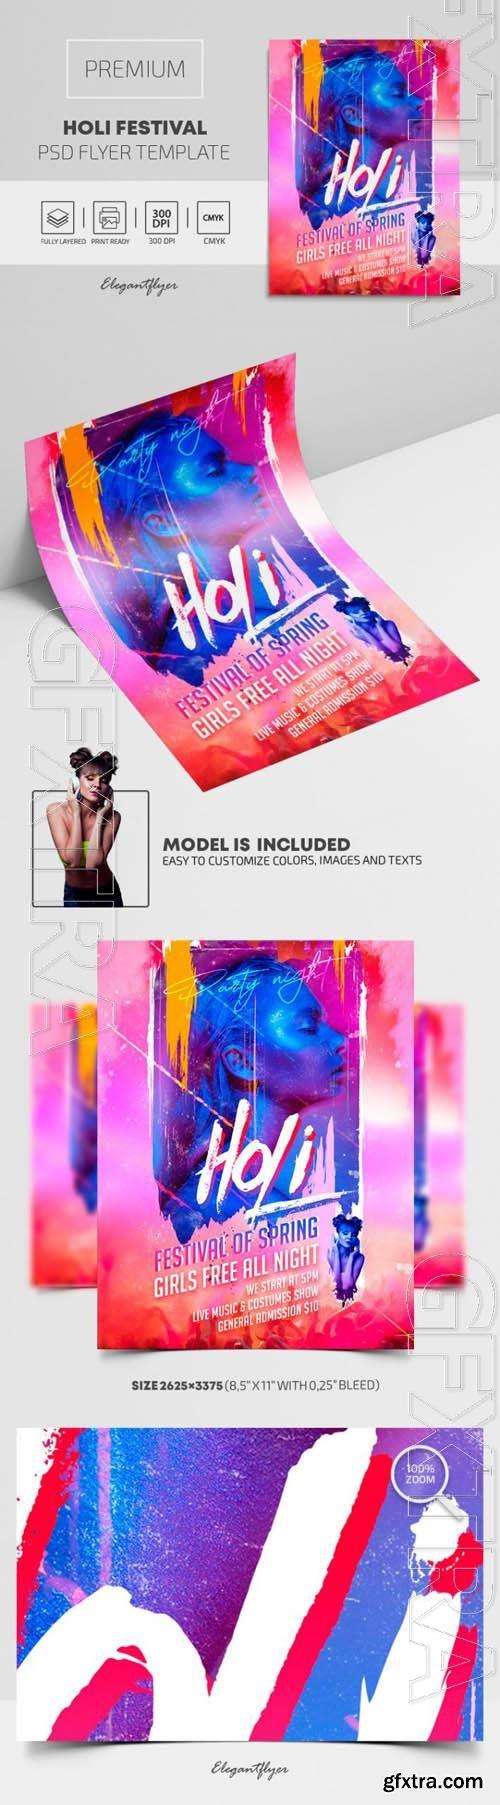 Holi Festival Premium PSD Flyer Template